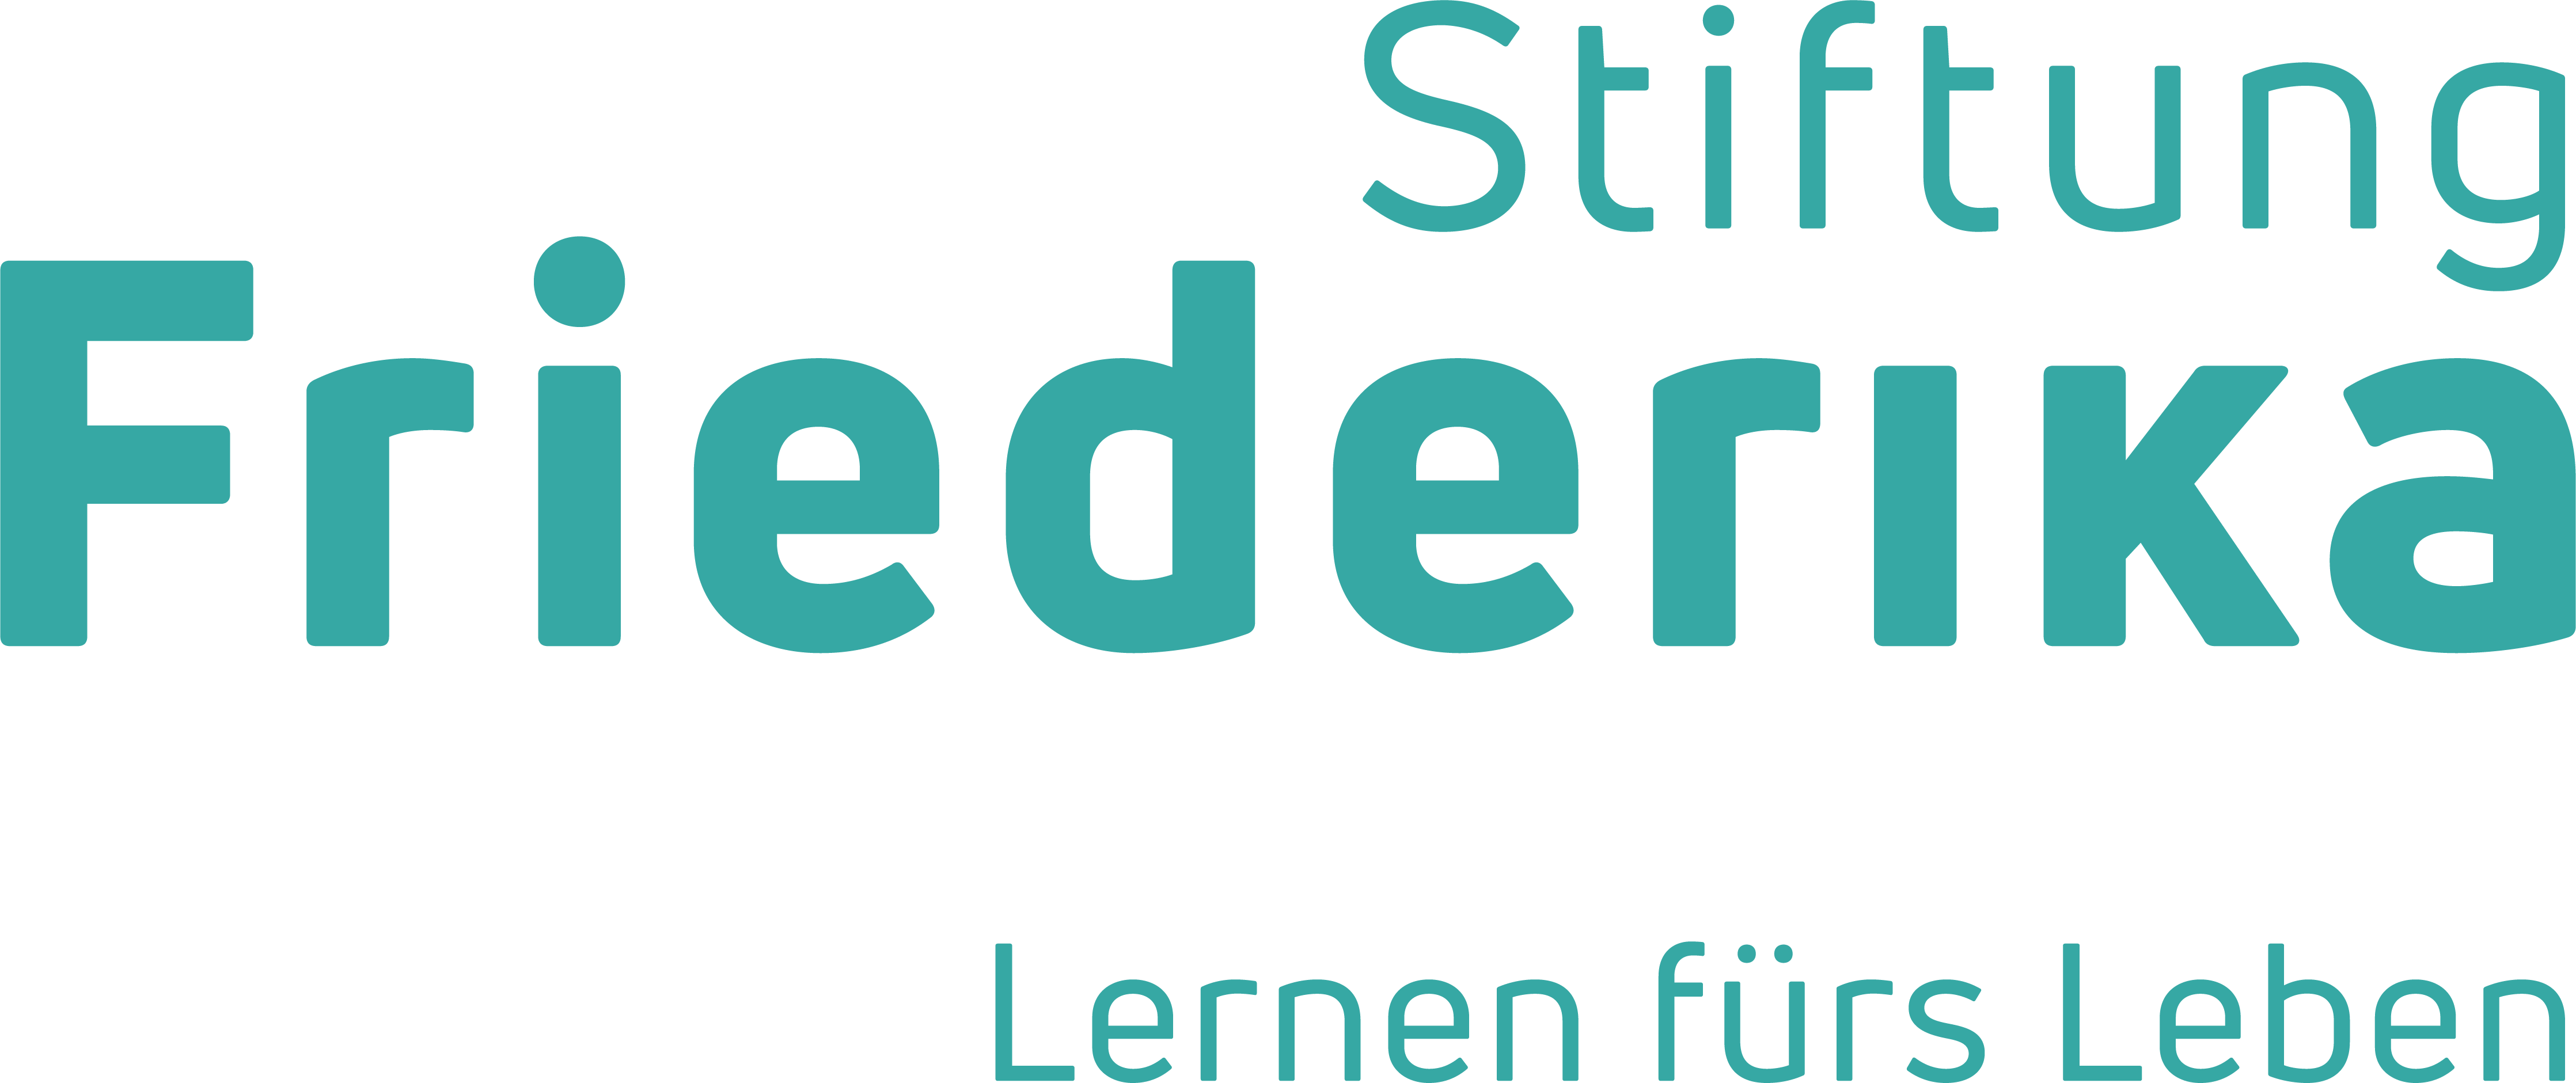 Friederika Stiftung